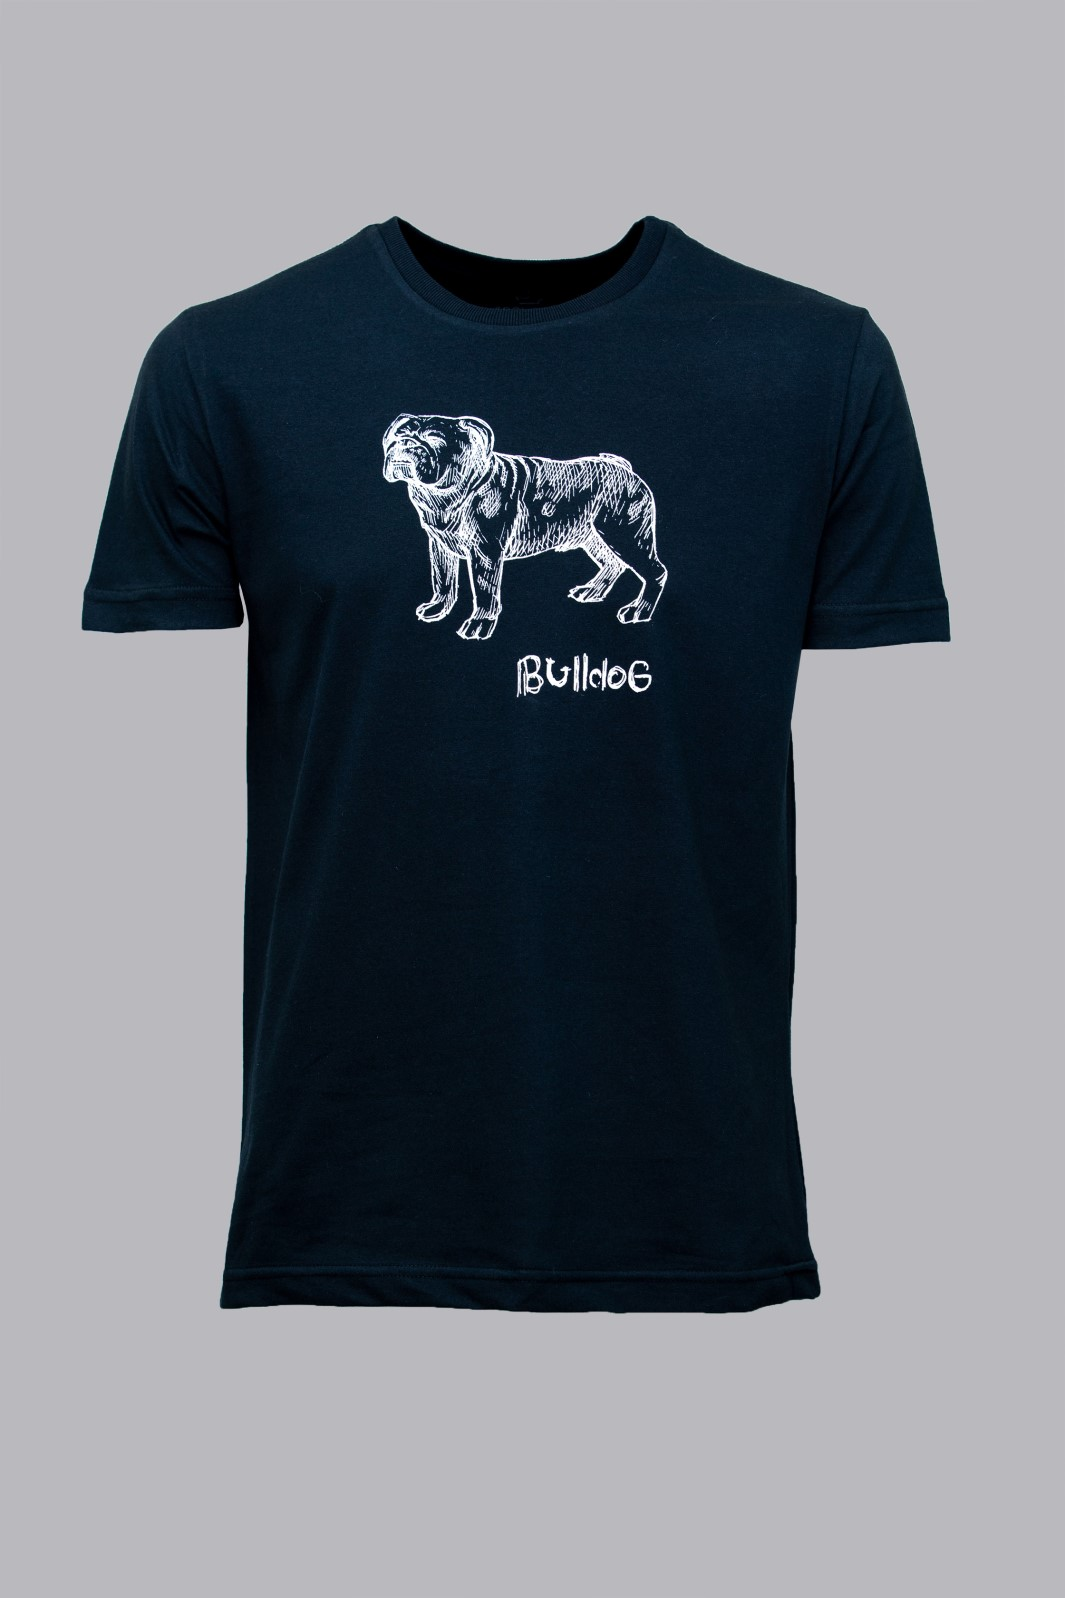 Camiseta CoolWave Bulldog